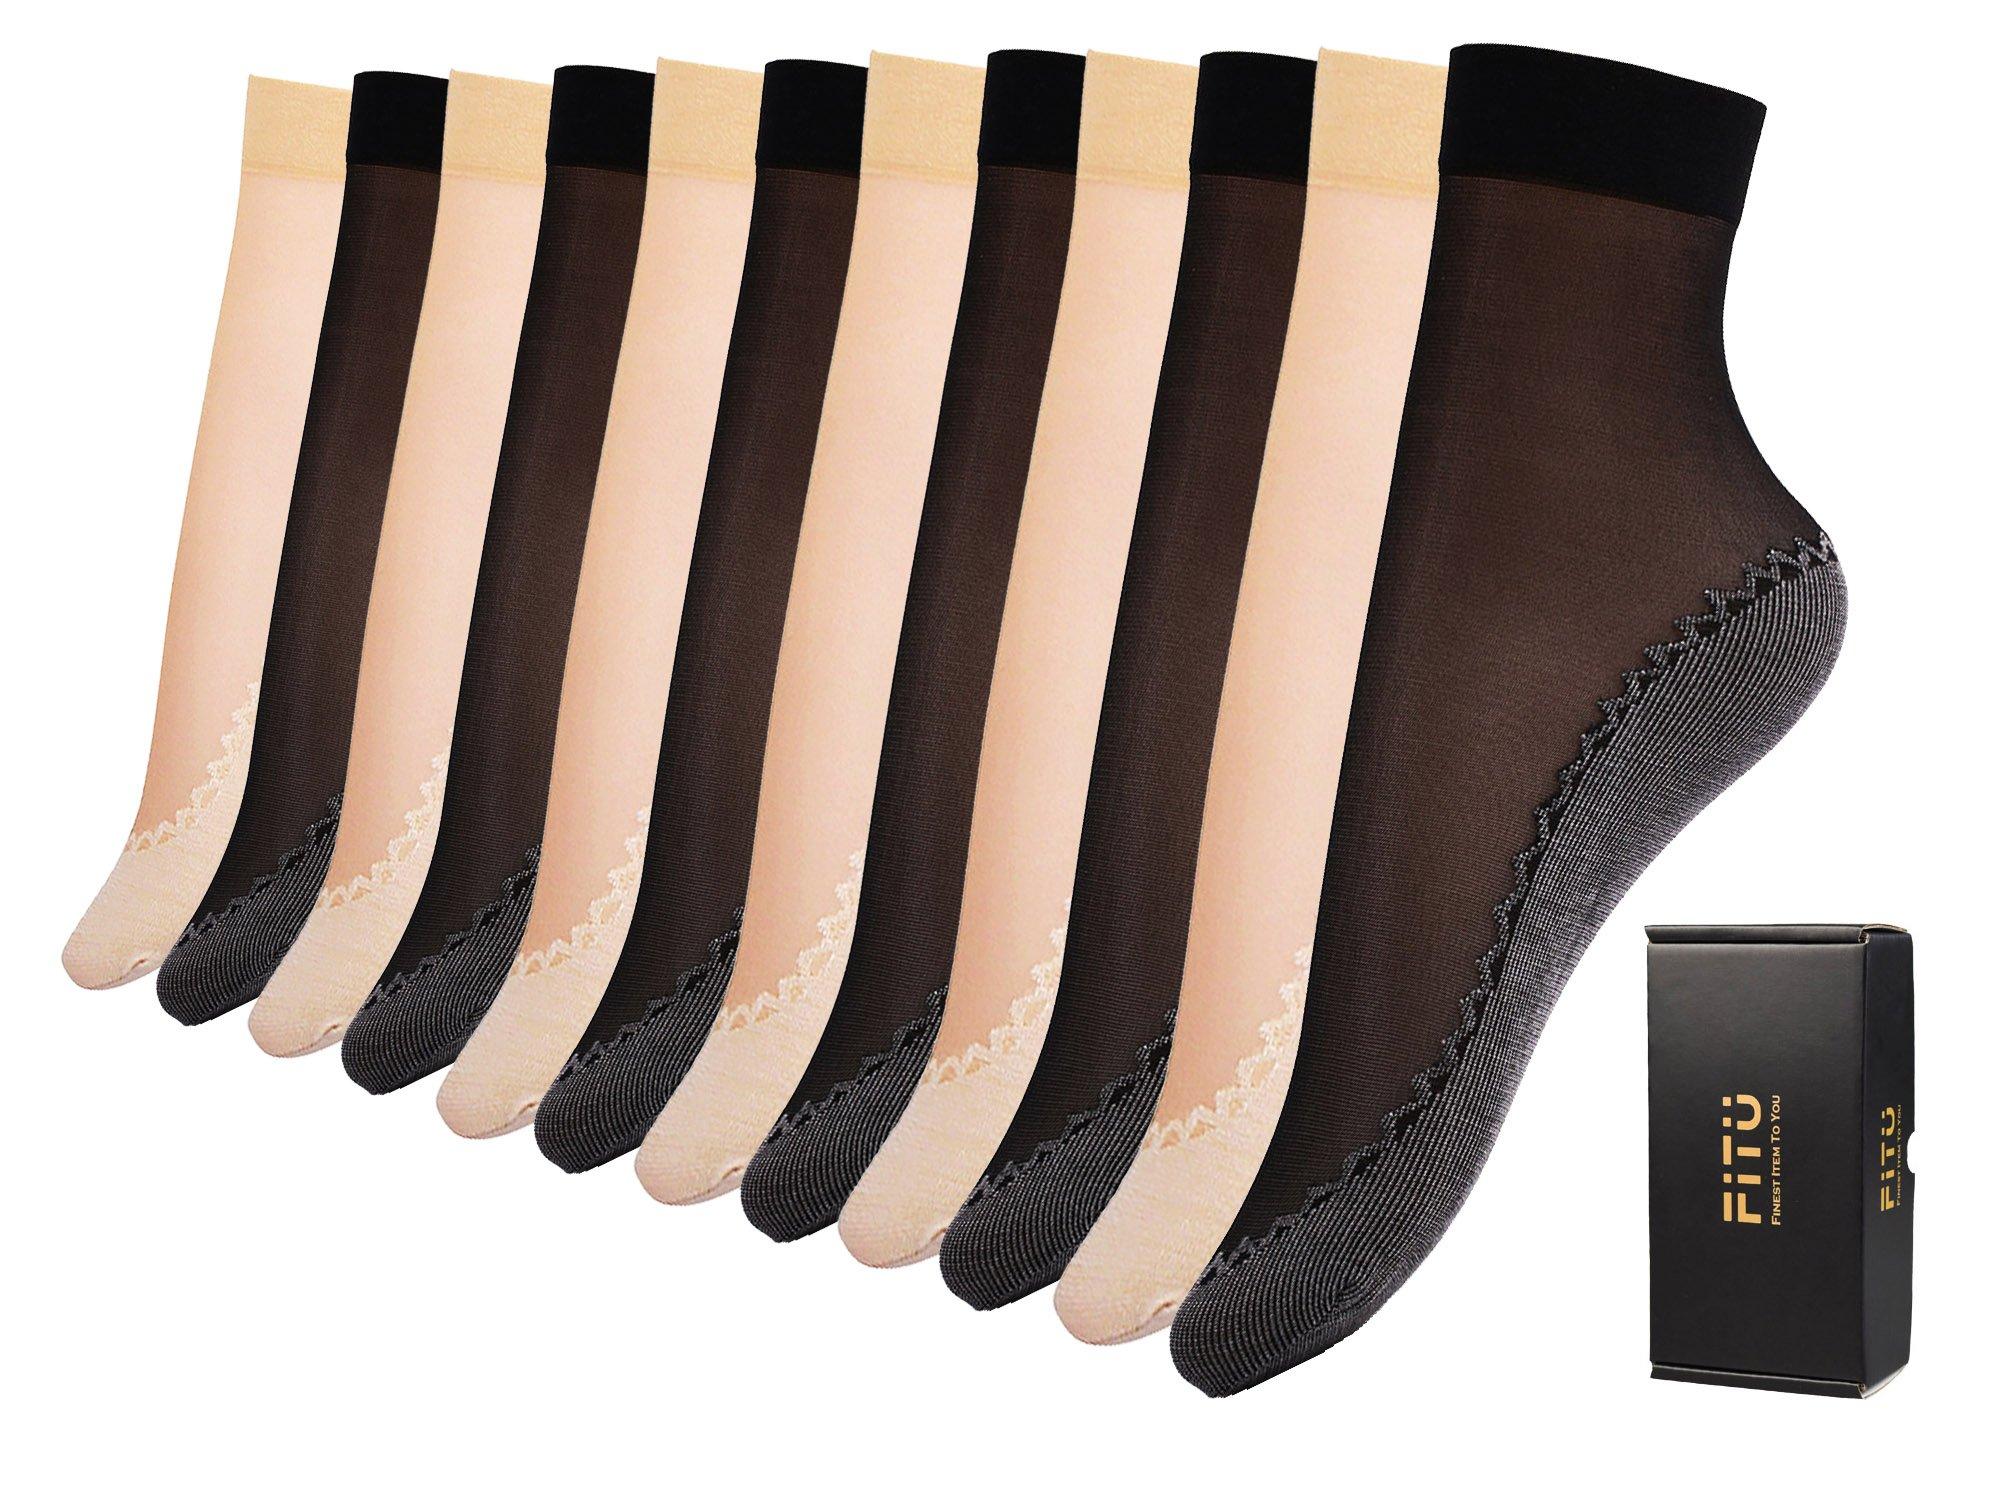 Fitu Women's 12 Pairs Silky Cotton Sole Sheer Ankle High Nylon Tights Hosiery Socks (Cotton Sole 6 Black 6 Beige) …